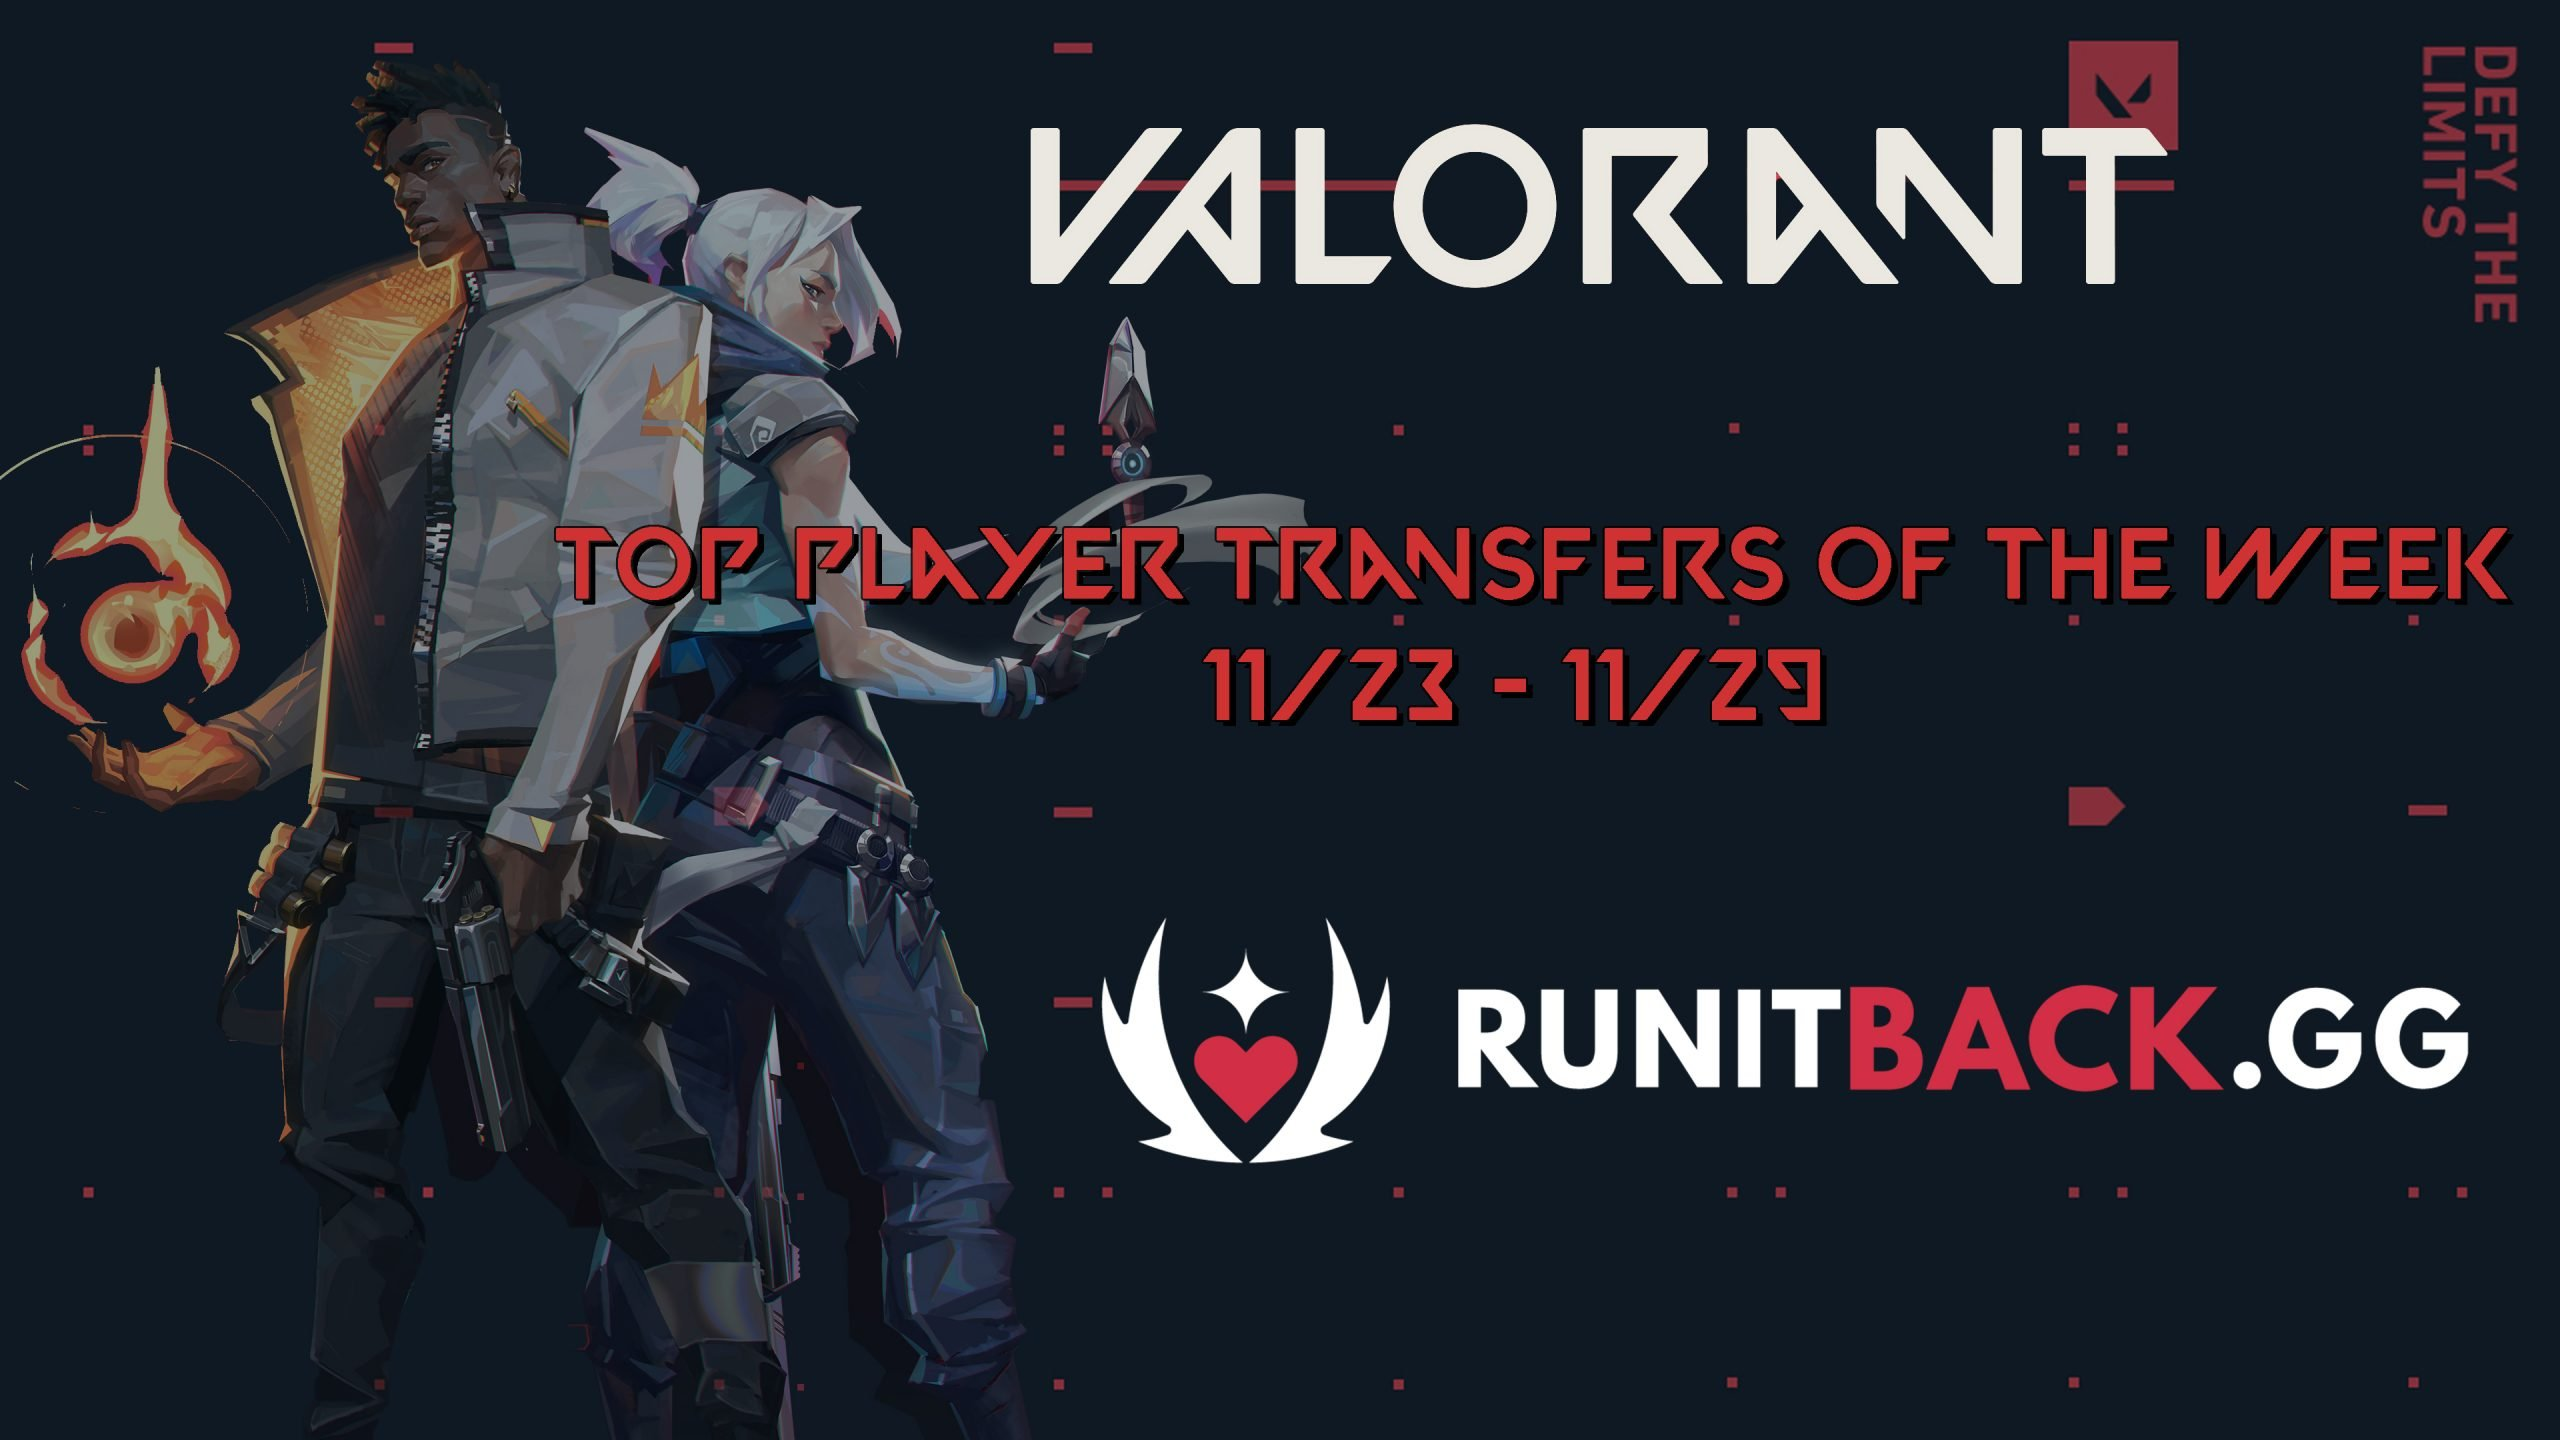 Top Player Transfers of the Week: November 23 – November 29